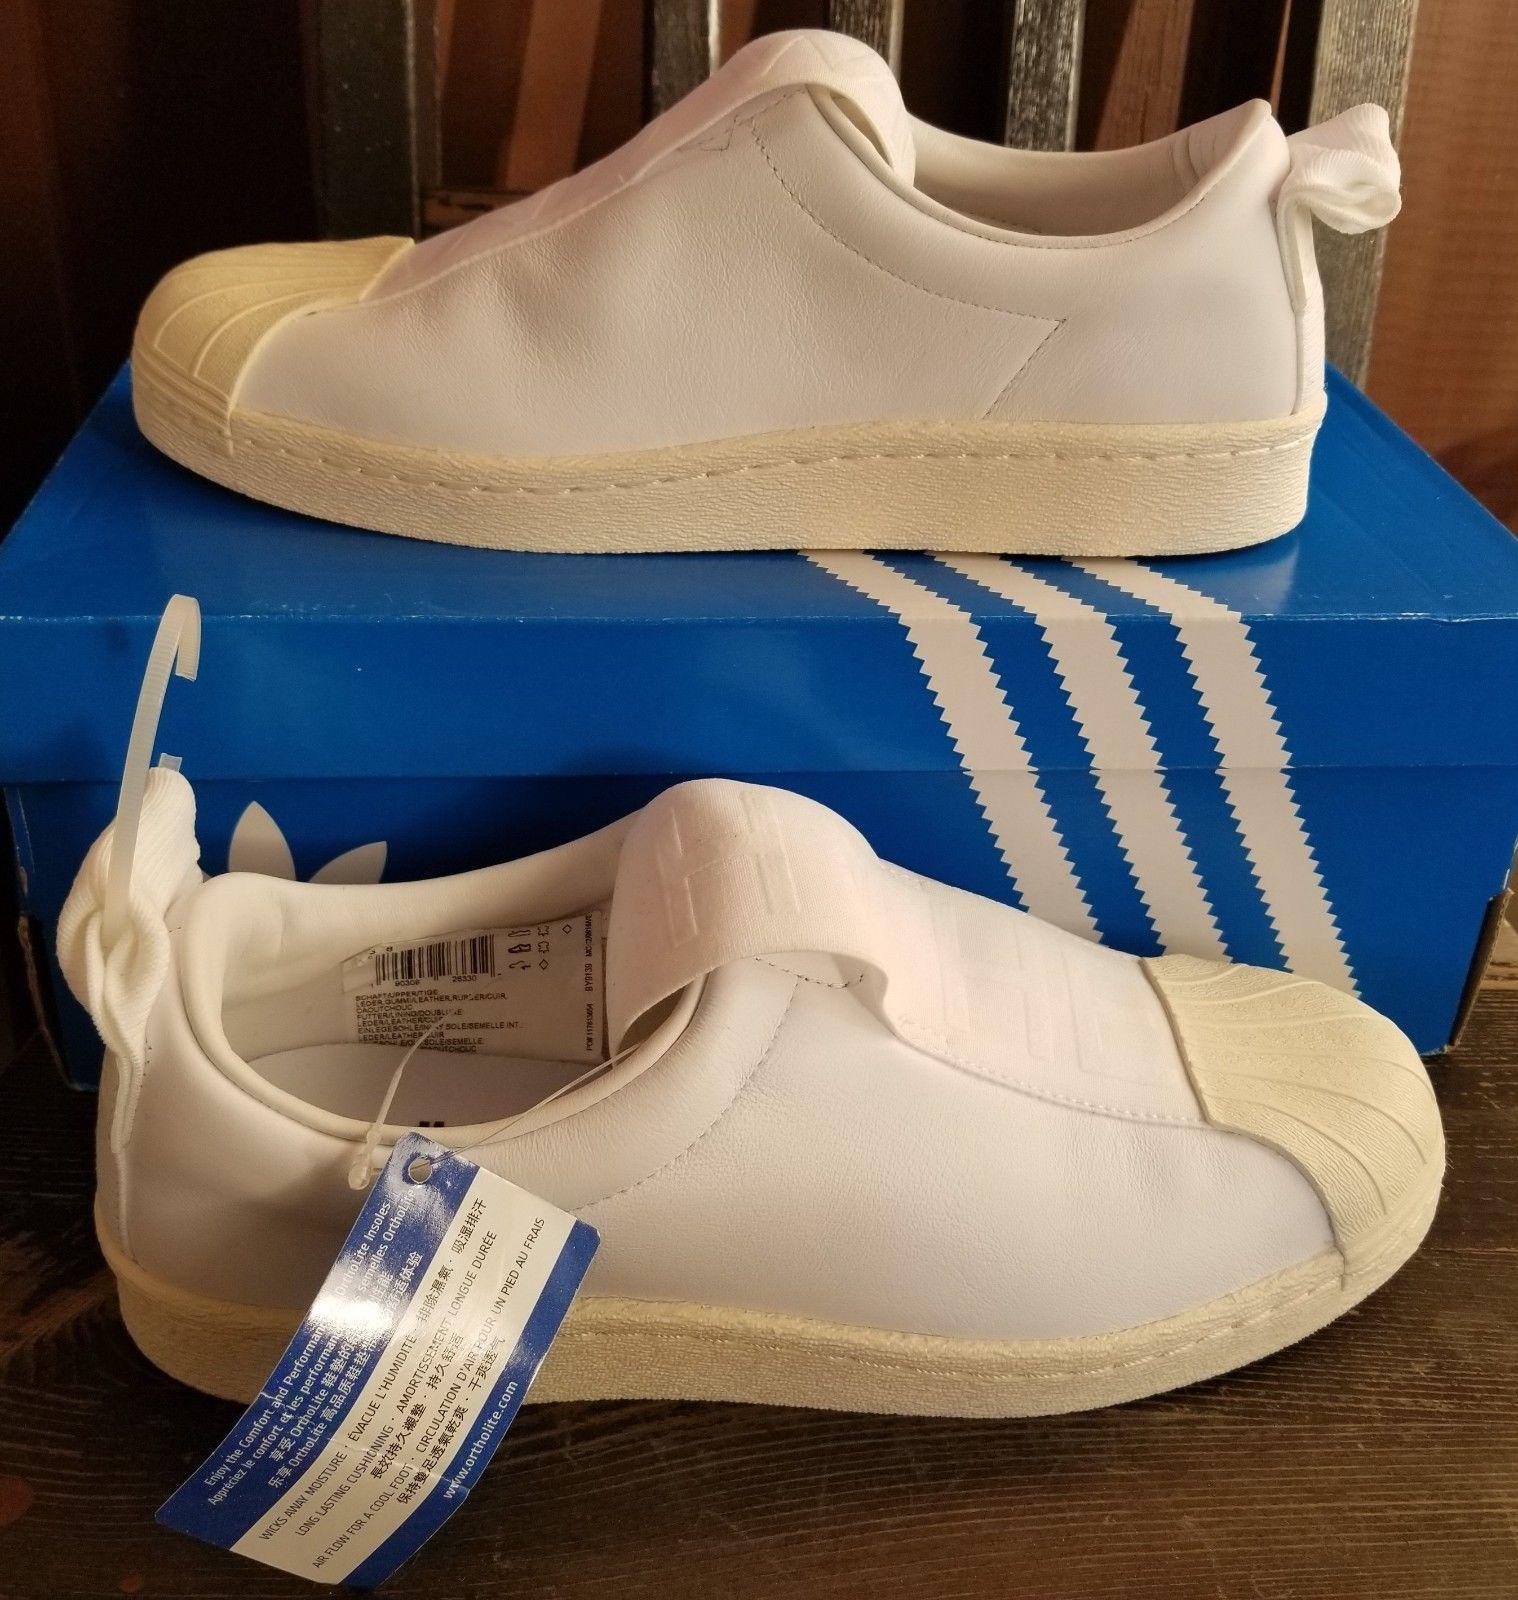 ejemplo Oscuro juntos  NEW AUTHENTIC ADIDAS ORIGINALS WOMEN'S SUPERSTAR BW3S SLIP-ON SHOES US 8  190309263302 | eBay | Adidas originals women, Slip on shoes, Adidas  originals